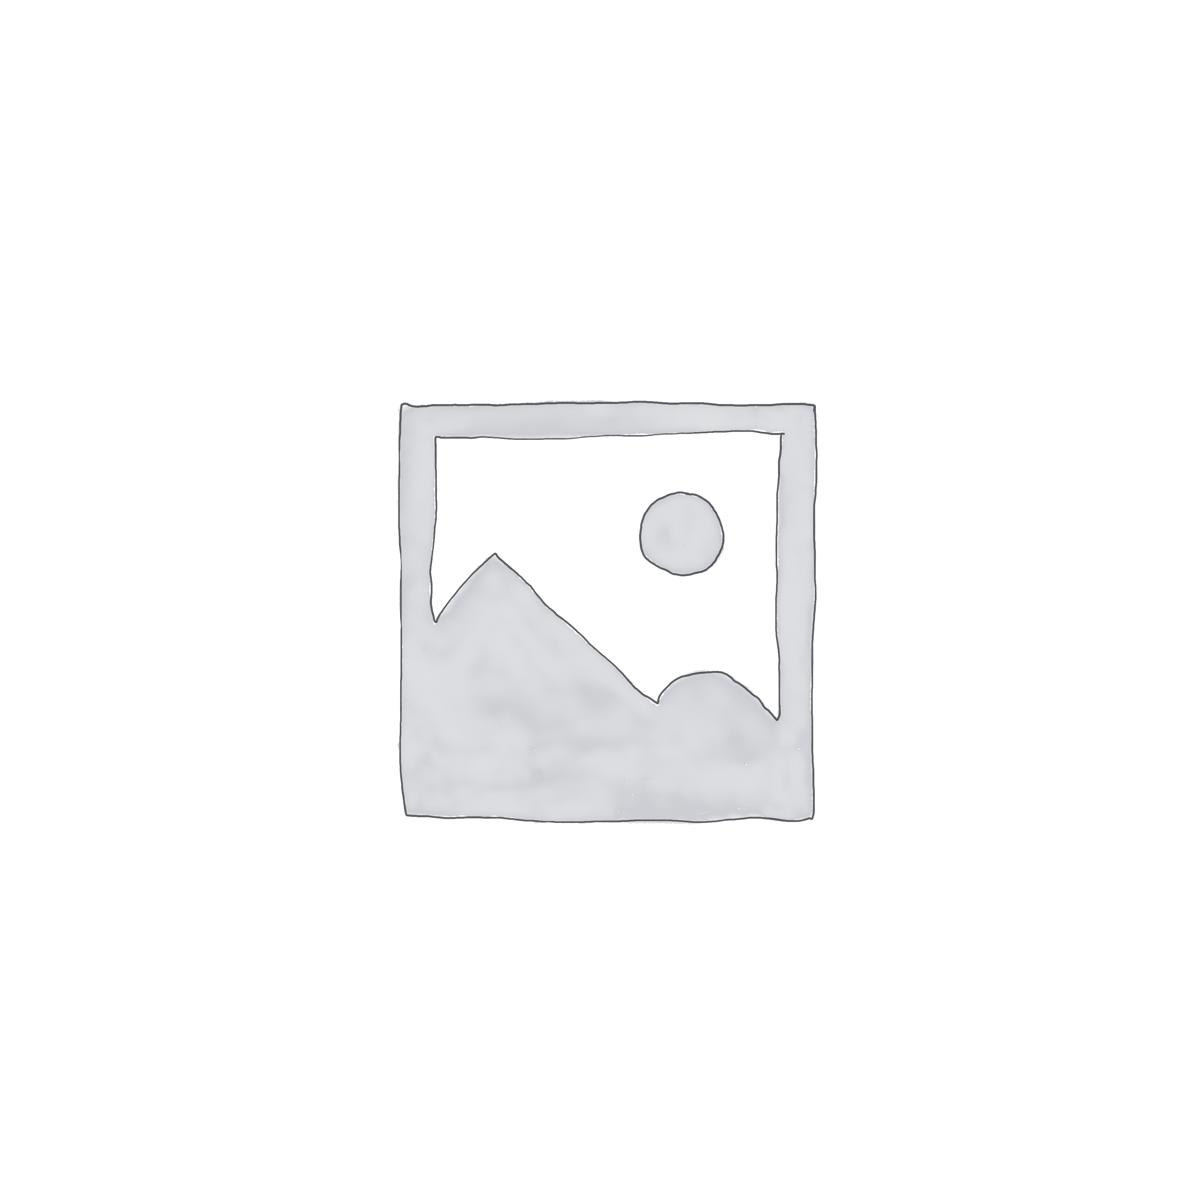 Tropical Cartoon Palm Tree and Banana Leaves Wallpaper Mural